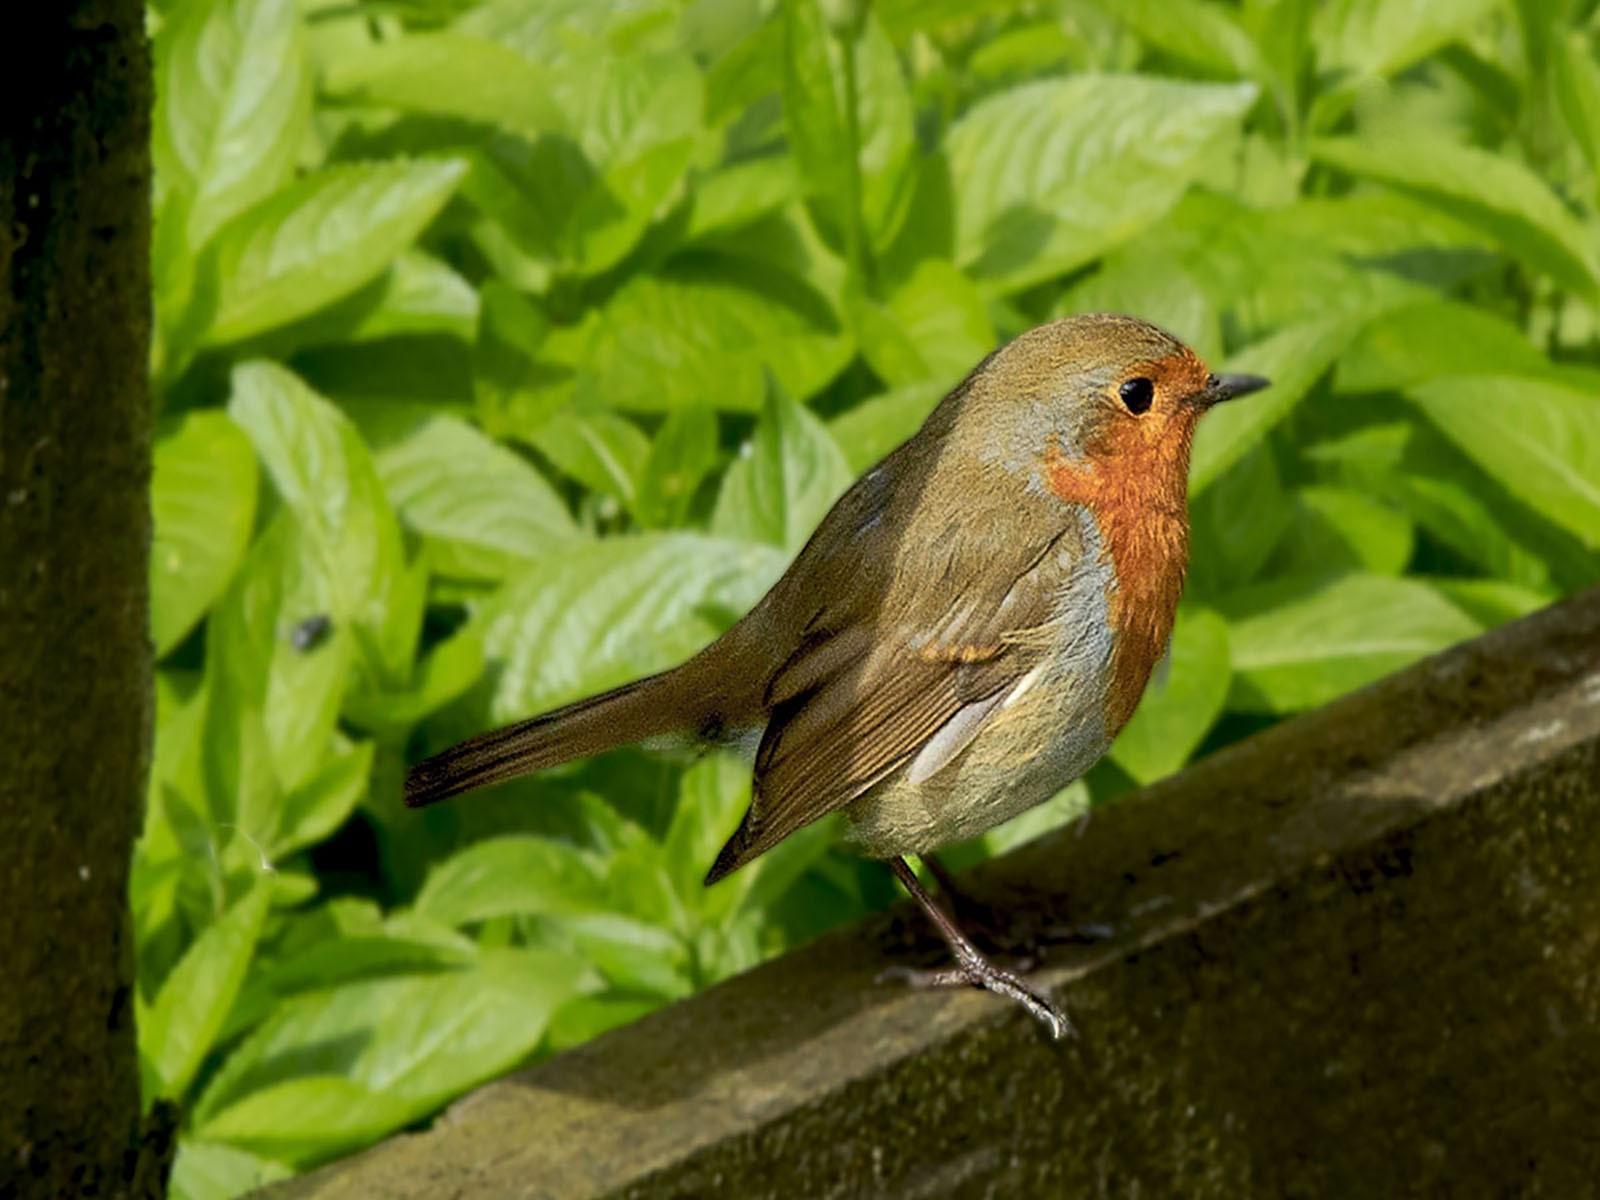 5. Robin Red Breast